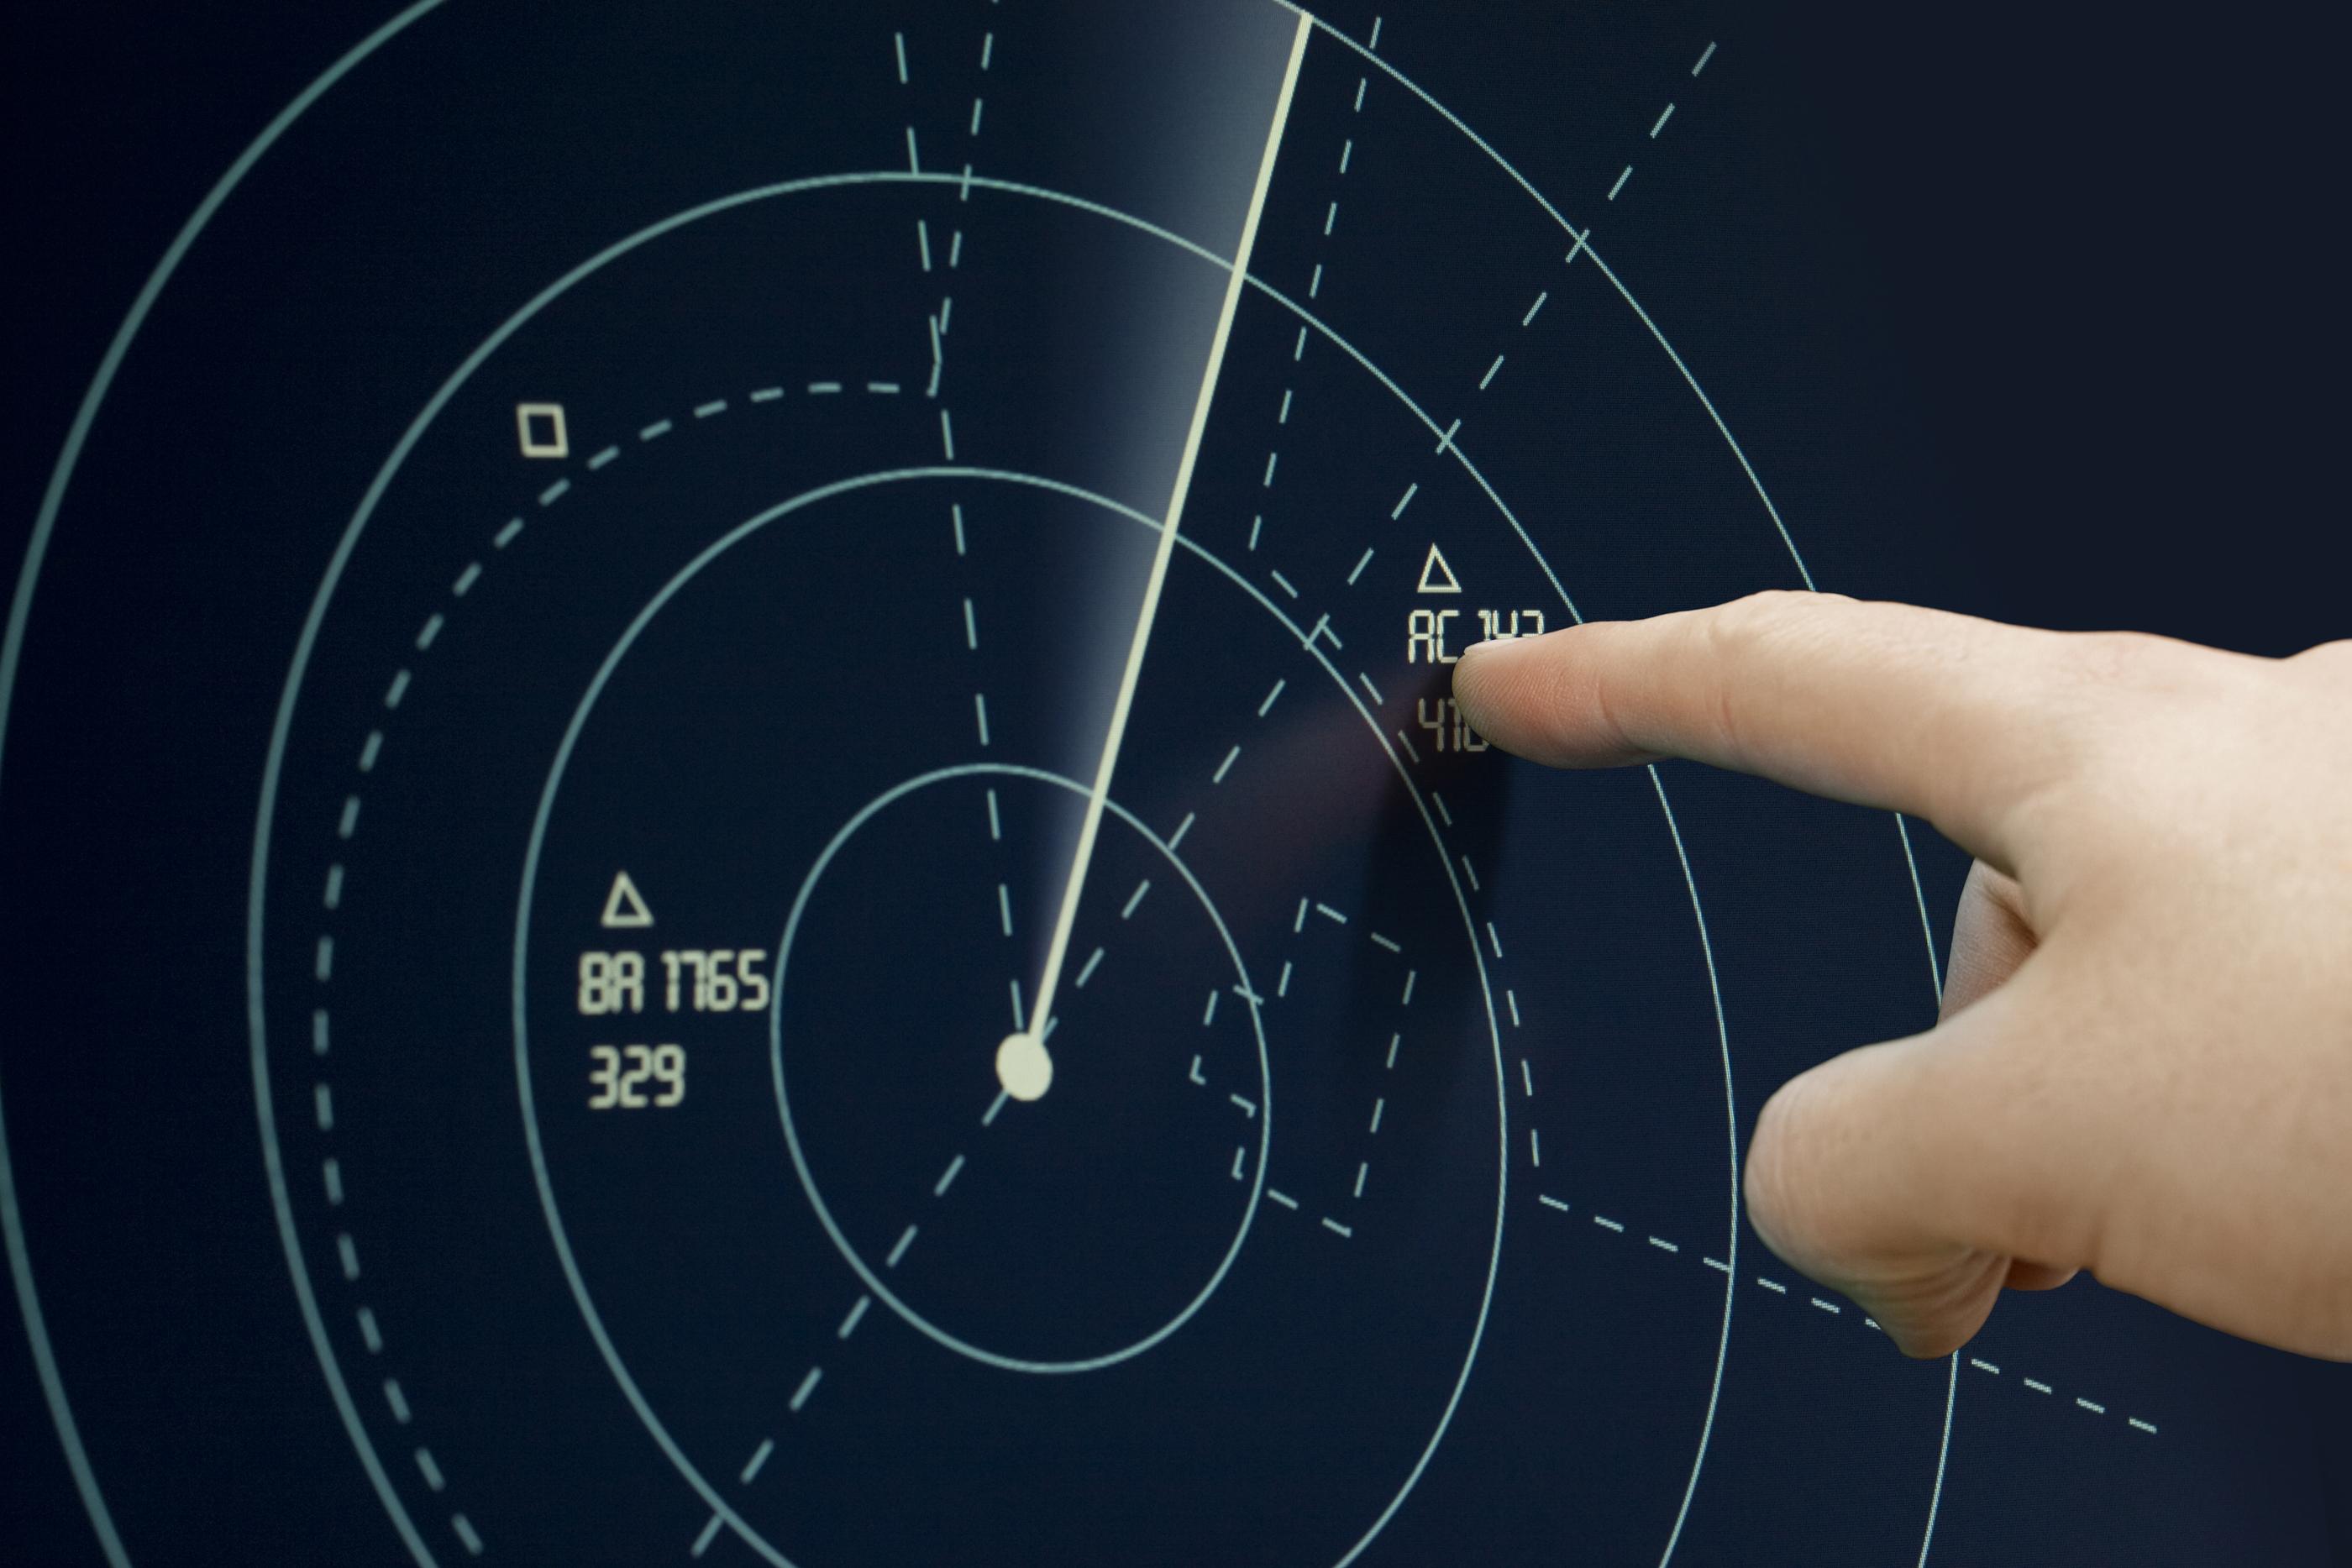 Radar Plane ATC EASA ATCO NATS